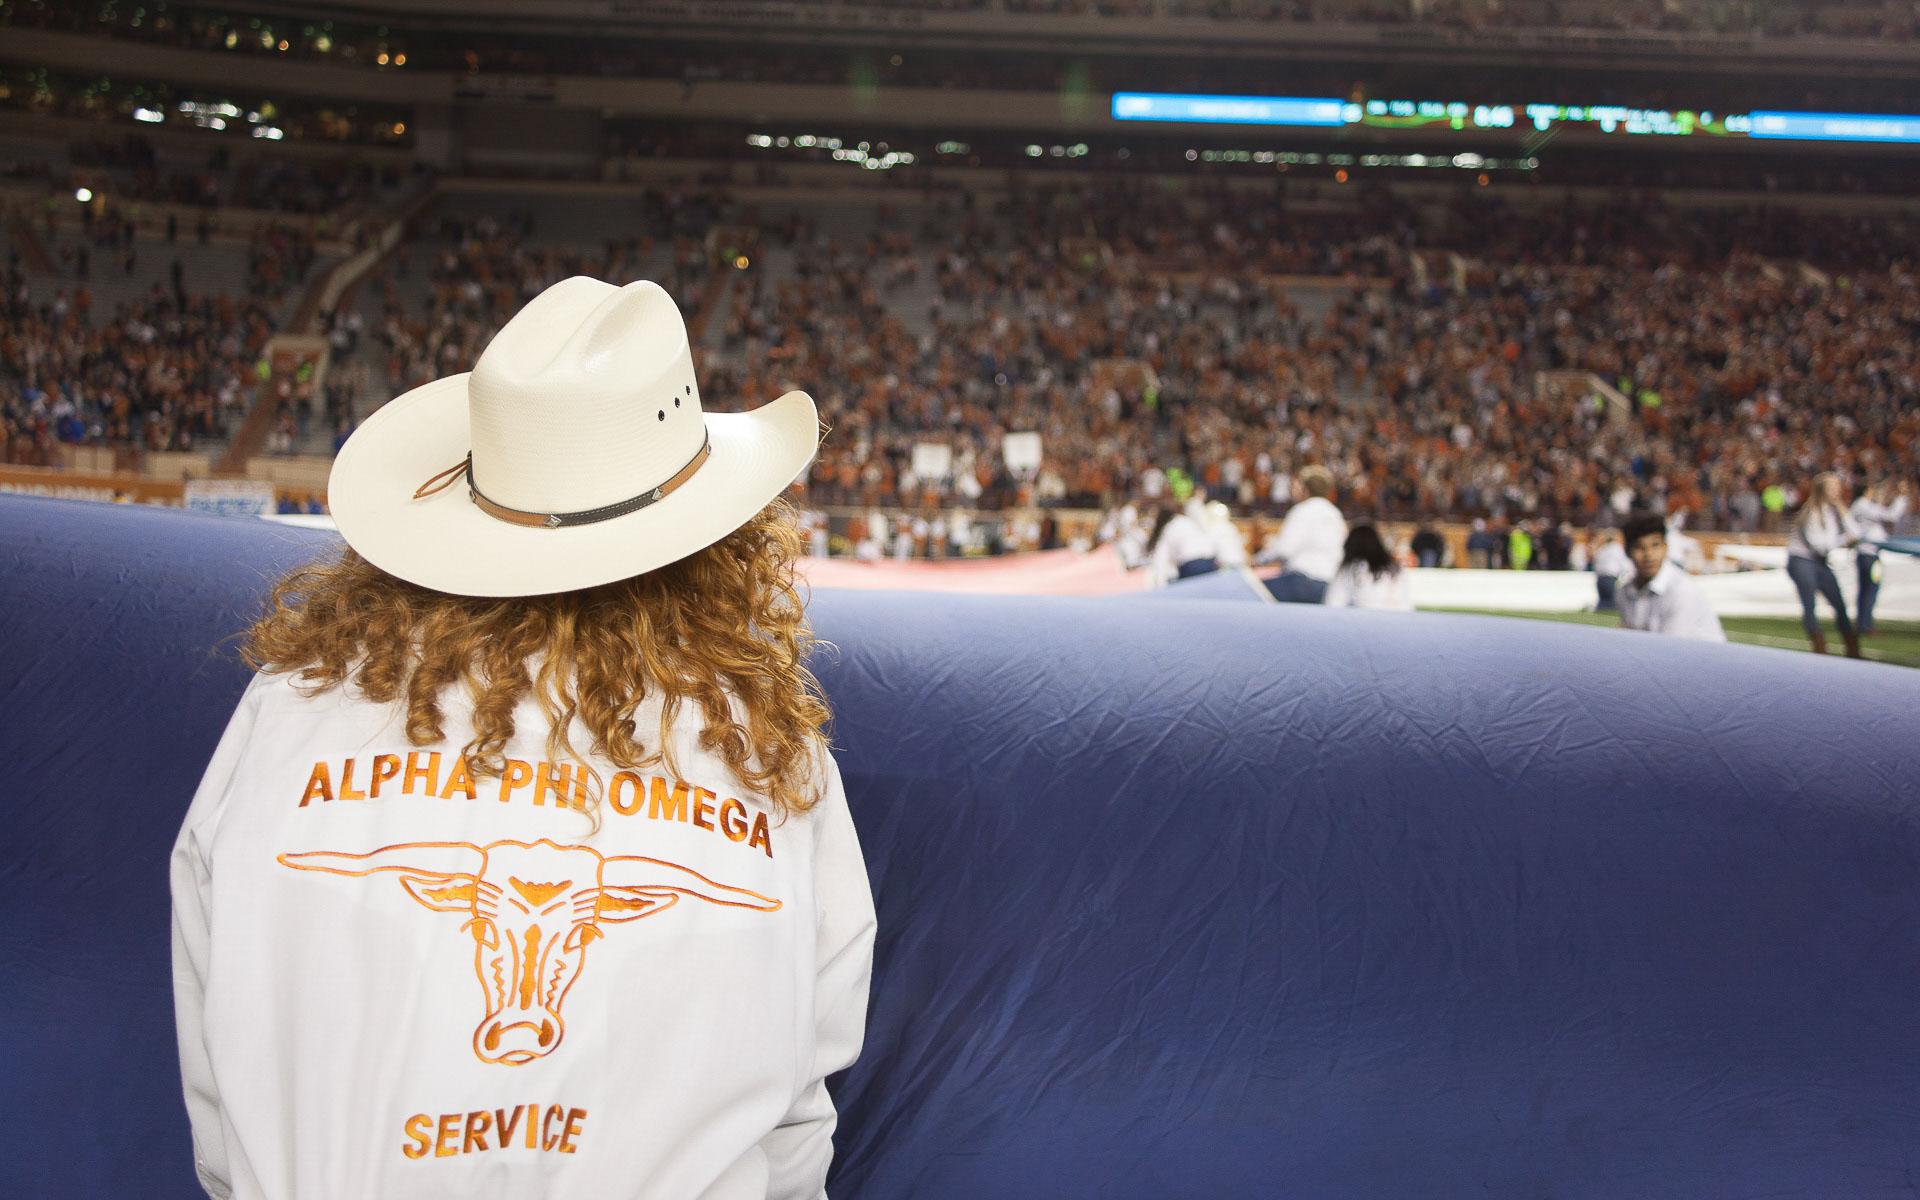 Texas Alpha Phi Omega